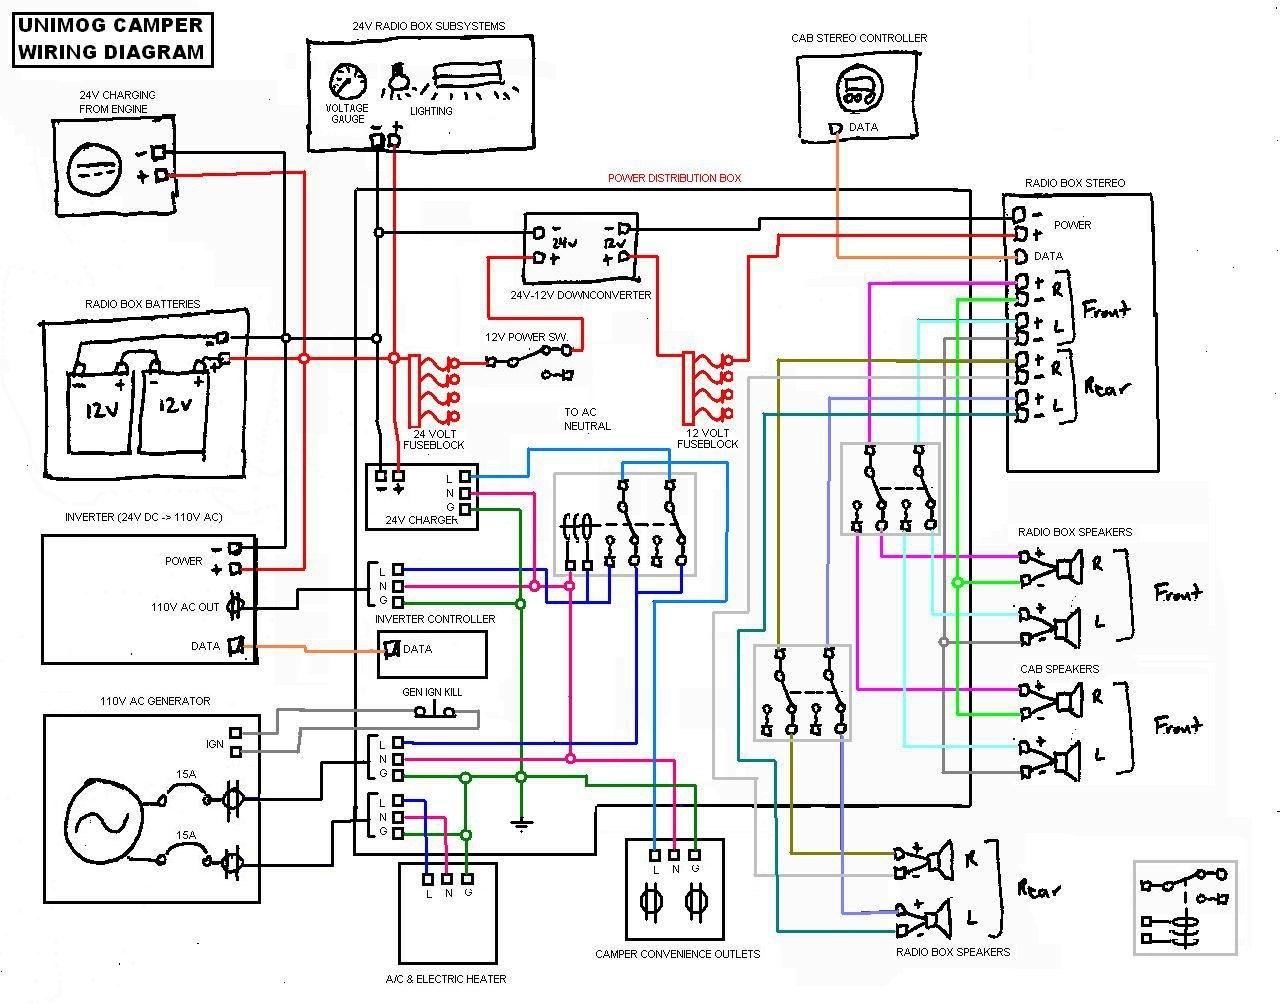 Wiring Diagram For A Camper - Wiring Diagram Detailed - Camper Trailer Wiring Diagram